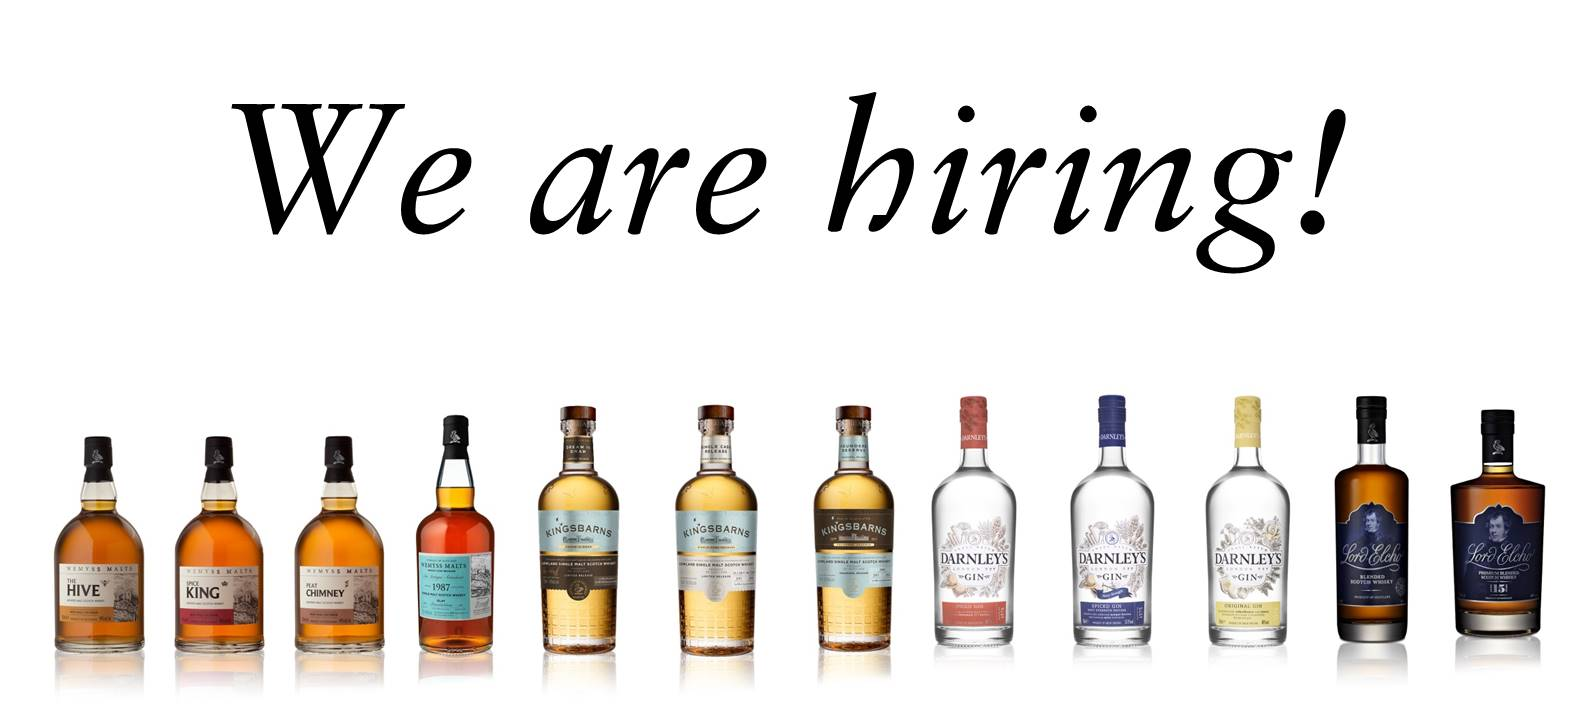 We are hiring!.jpg